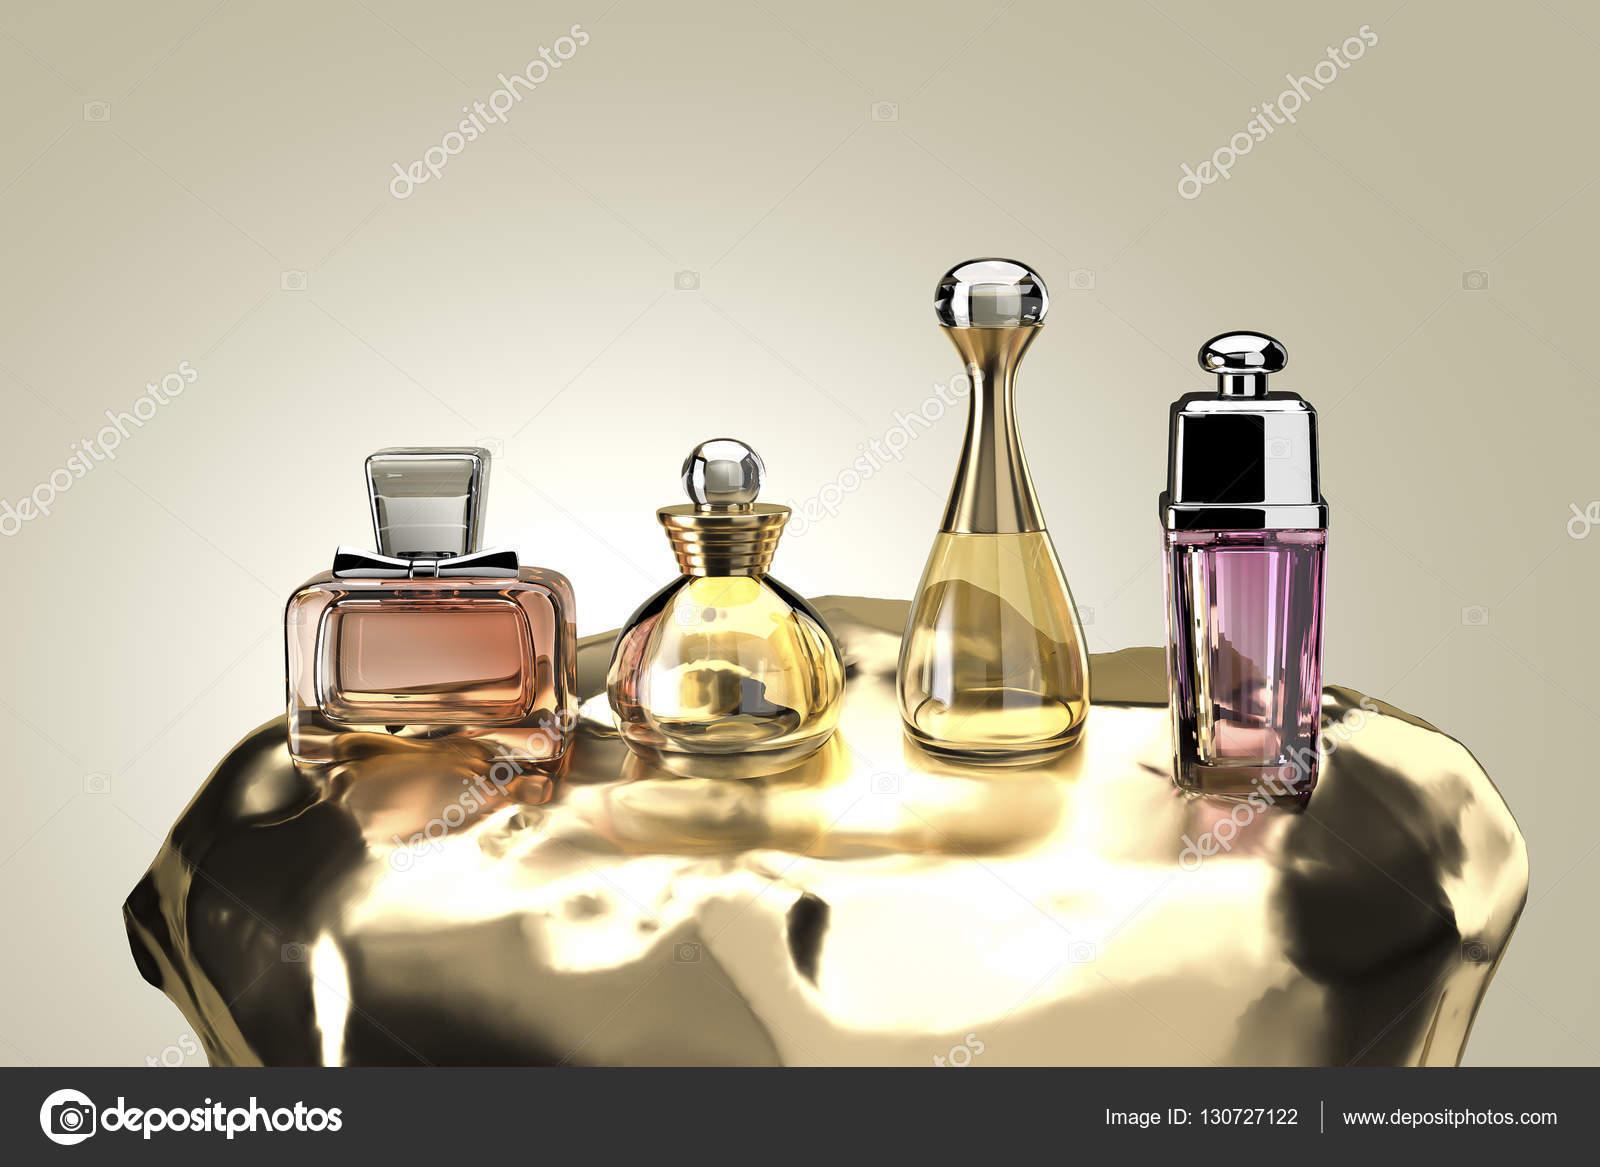 Premium Deluxe Perfume Packaging Gift Set 3d Rendering Stock Photo C Chonnajak 130727122